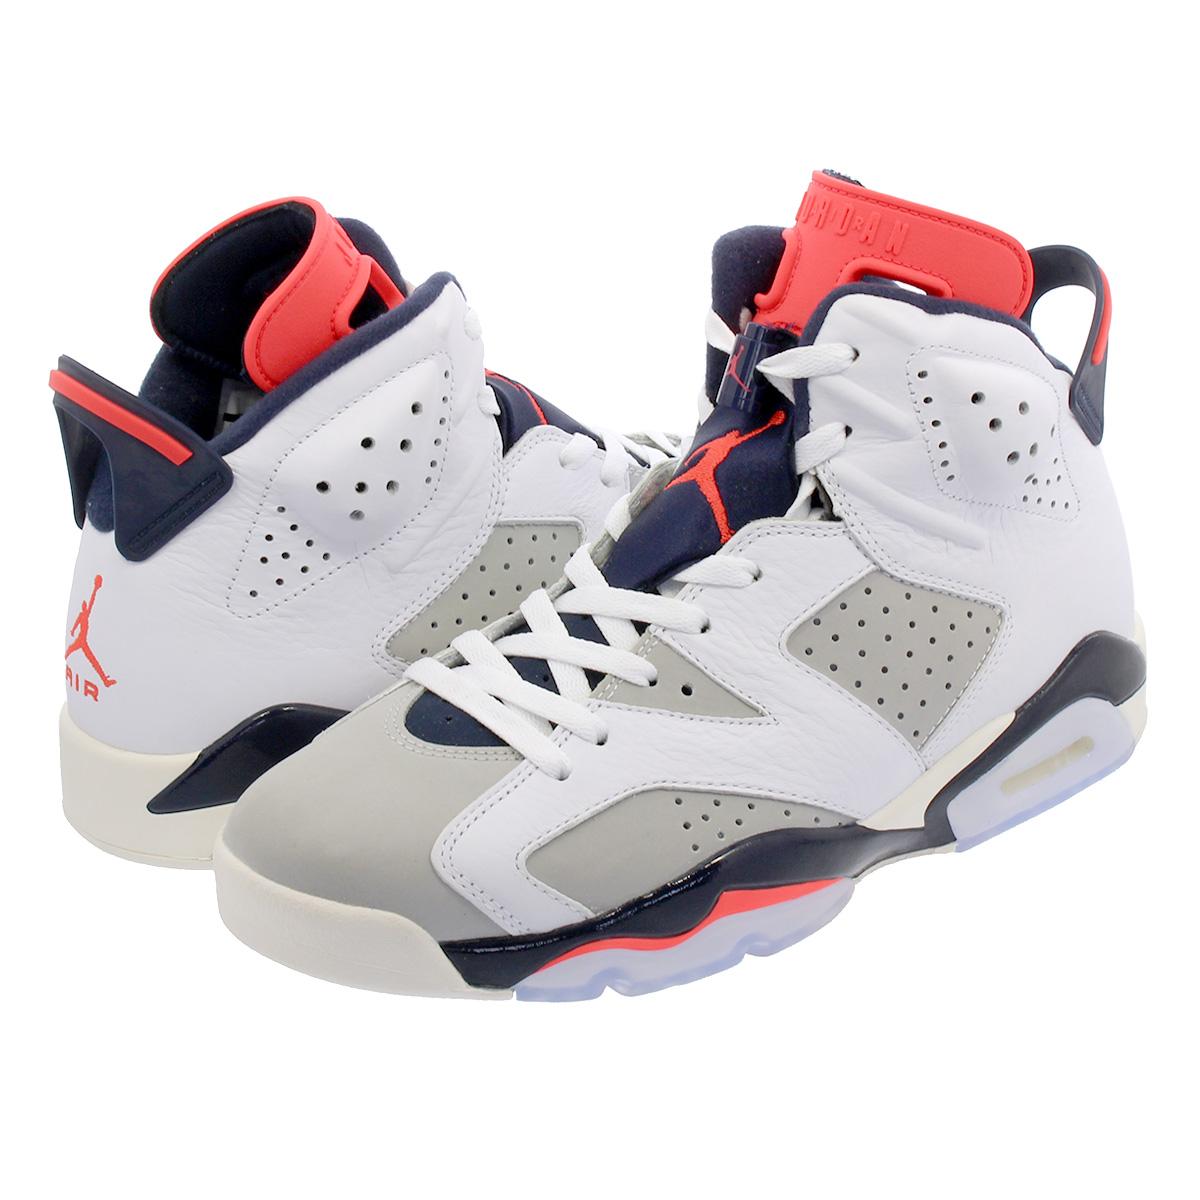 638bff8d51c48e NIKE AIR JORDAN 6 RETRO Nike Air Jordan 6 nostalgic WHITE INFRARED  23 GREY SAIL 384